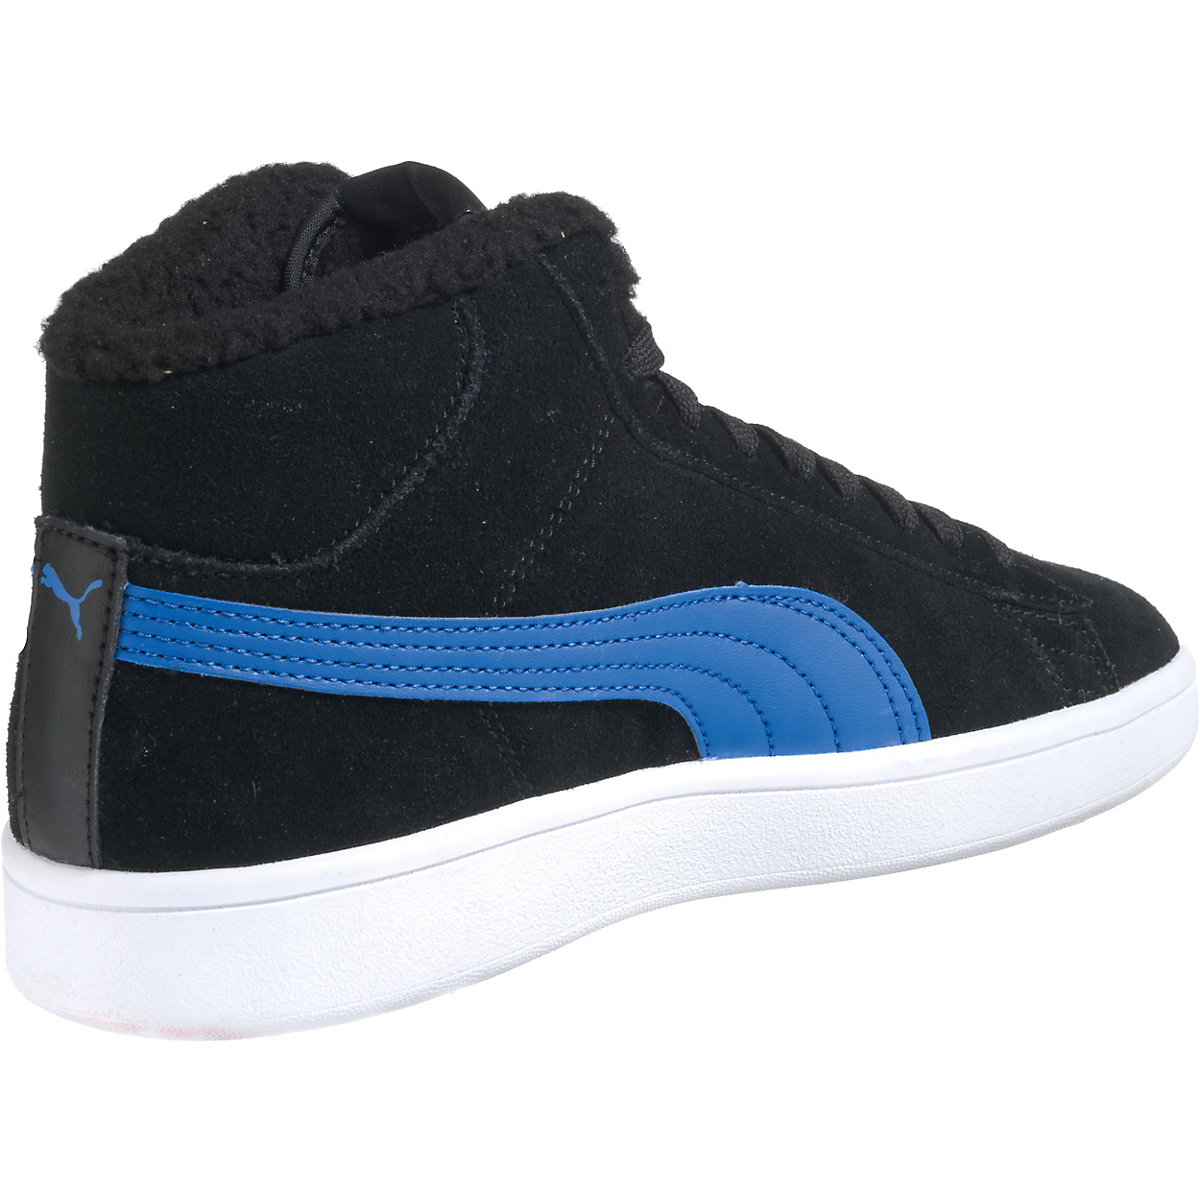 PUMA, Kinder Sneakers High Puma Smash v2 Mid Fur Jr für ...